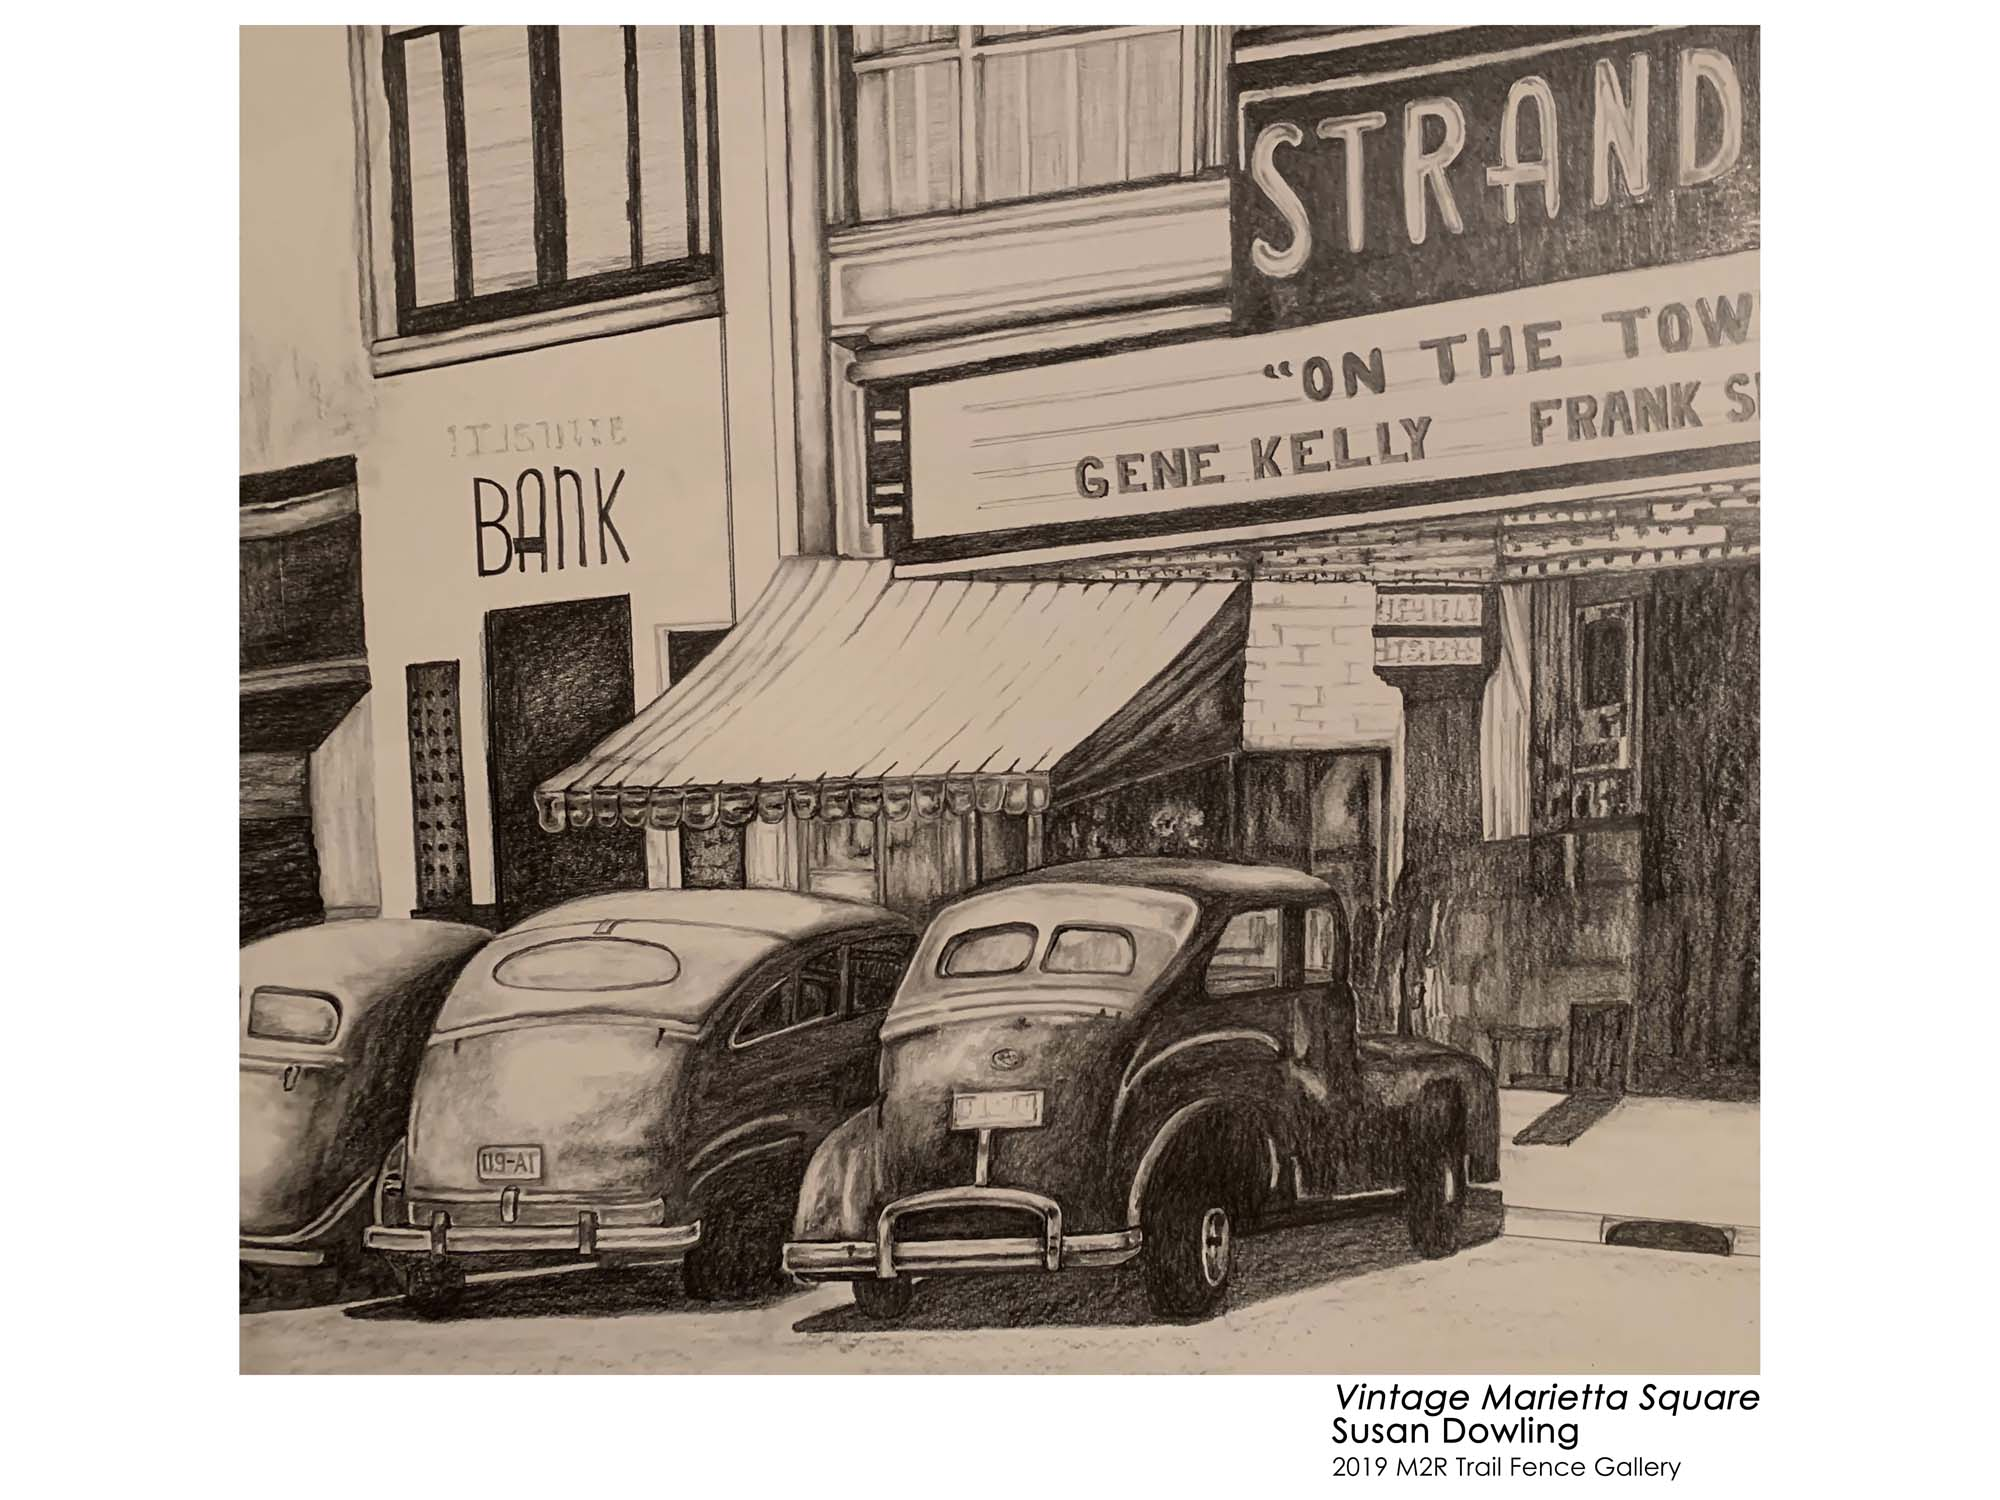 Susan_Dowling_Vintage Marietta Square - Susan D.jpg